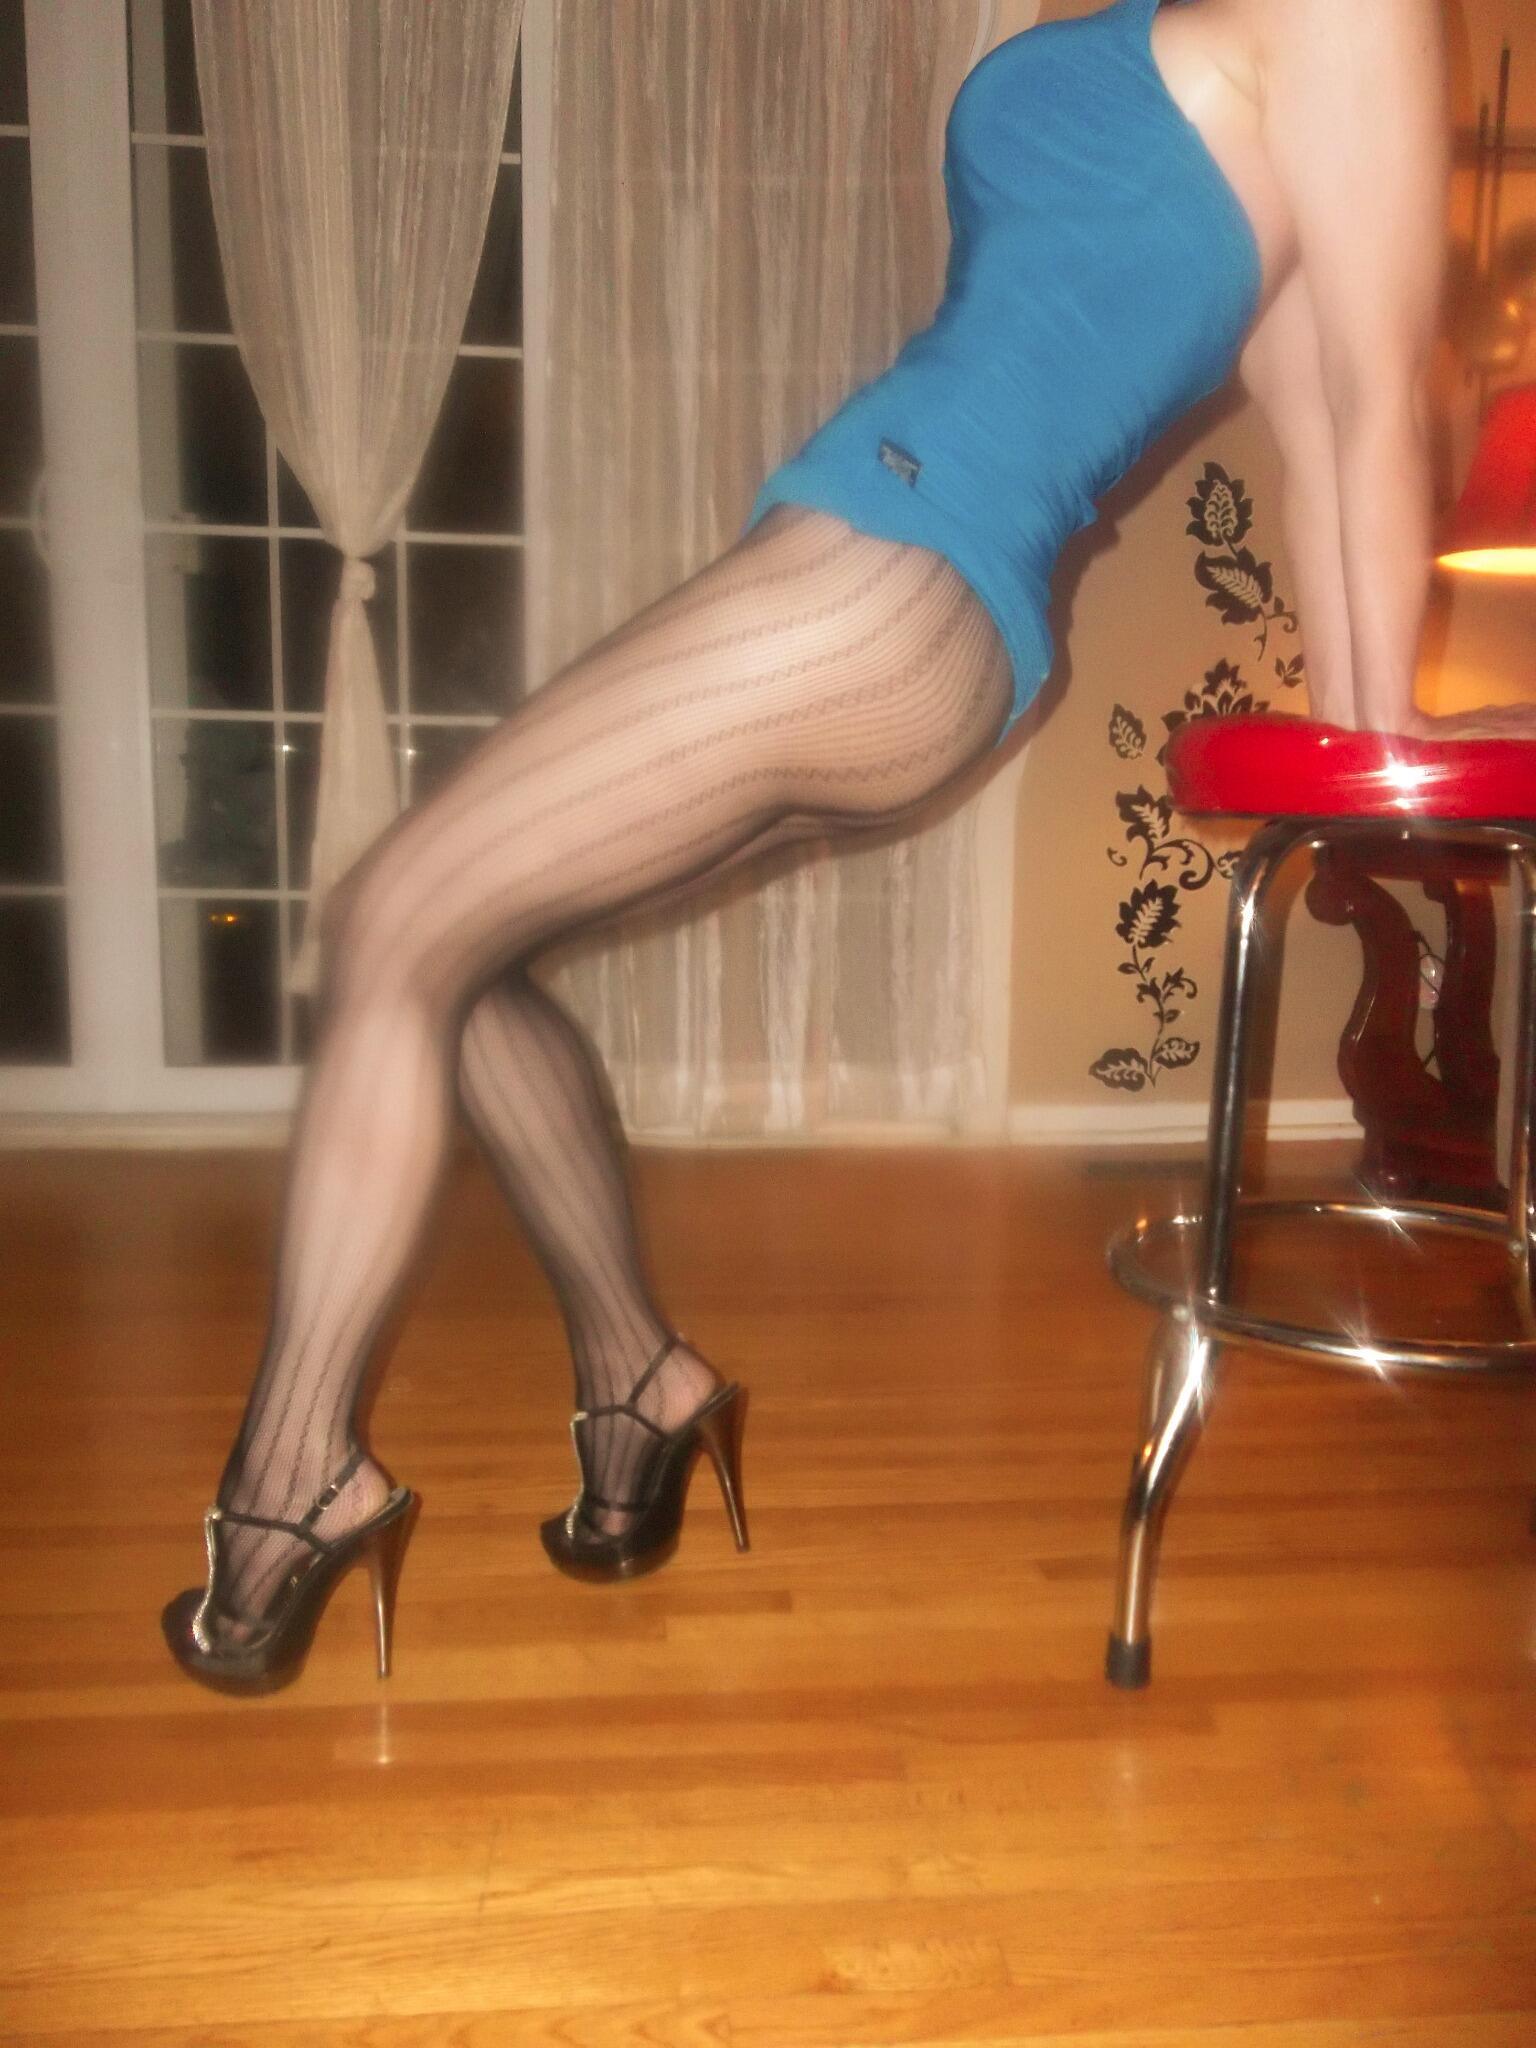 Naughty Natasha on Twitter: @creolelad2009 one here for